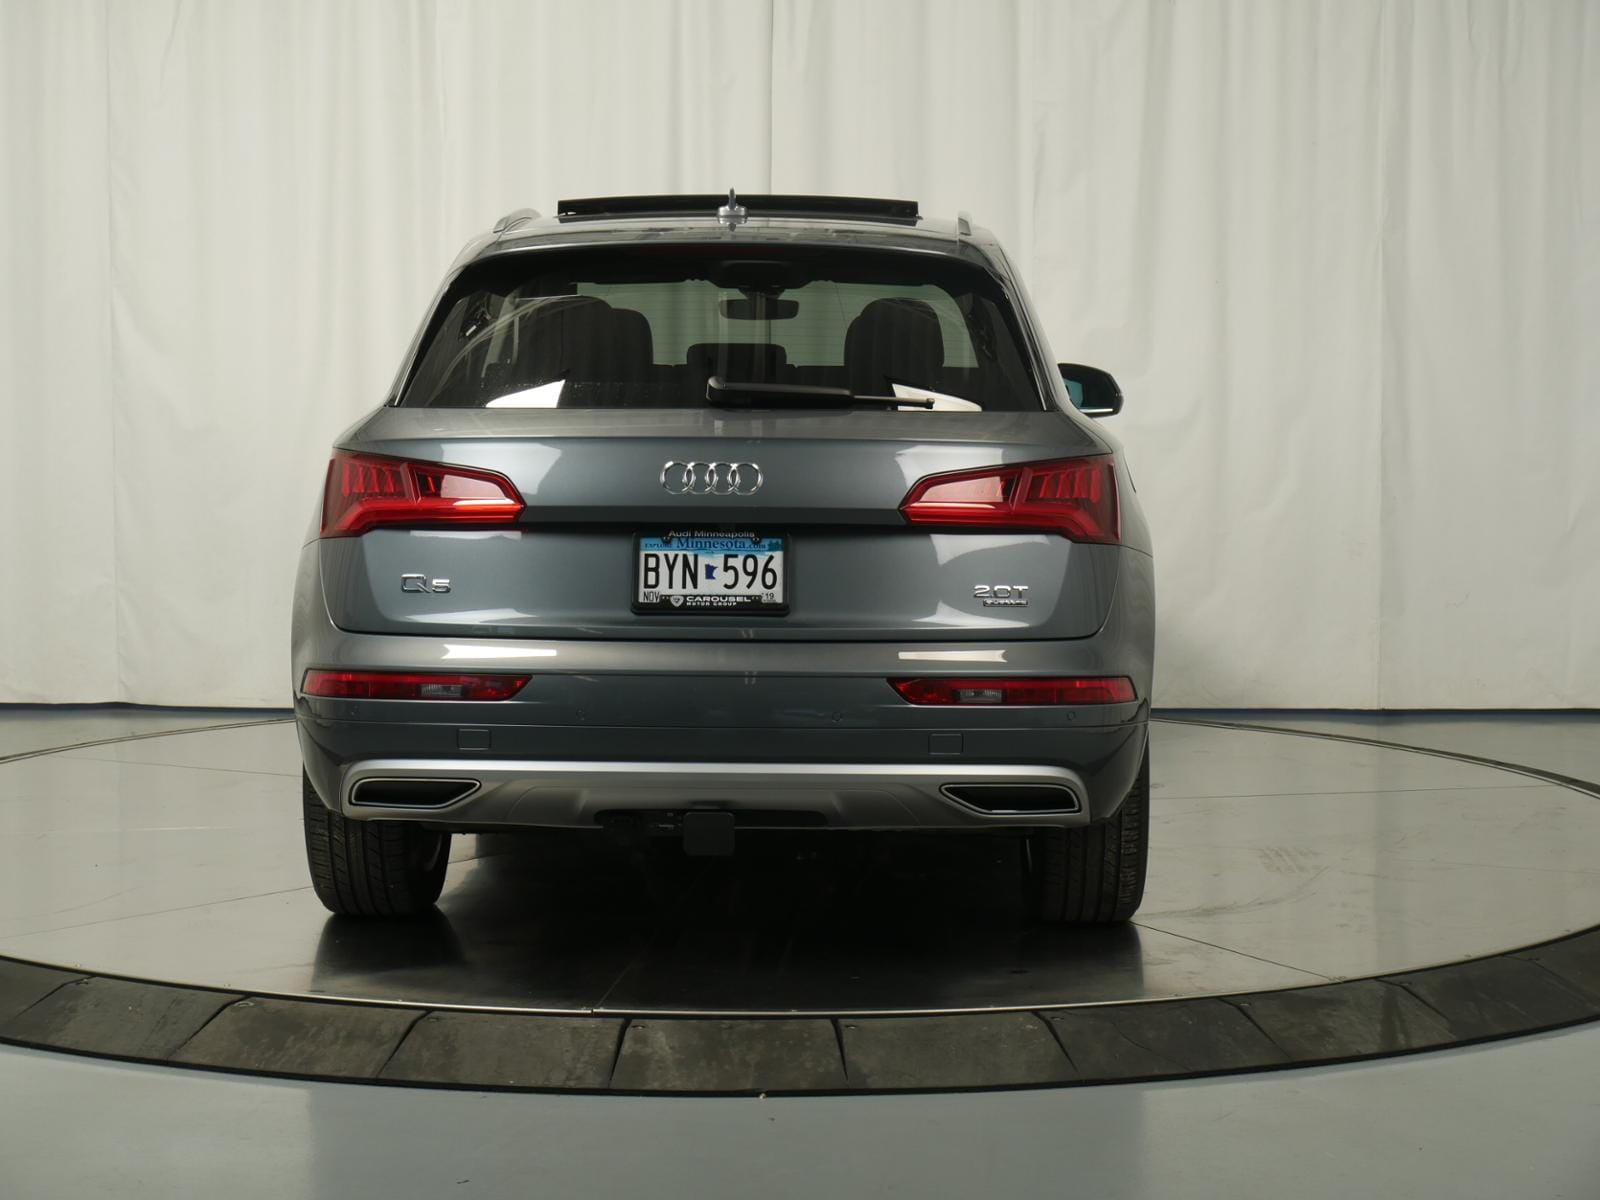 Used 2018 Audi Q5 For Sale at Audi Minneapolis | VIN: WA1BNAFY3J2234842